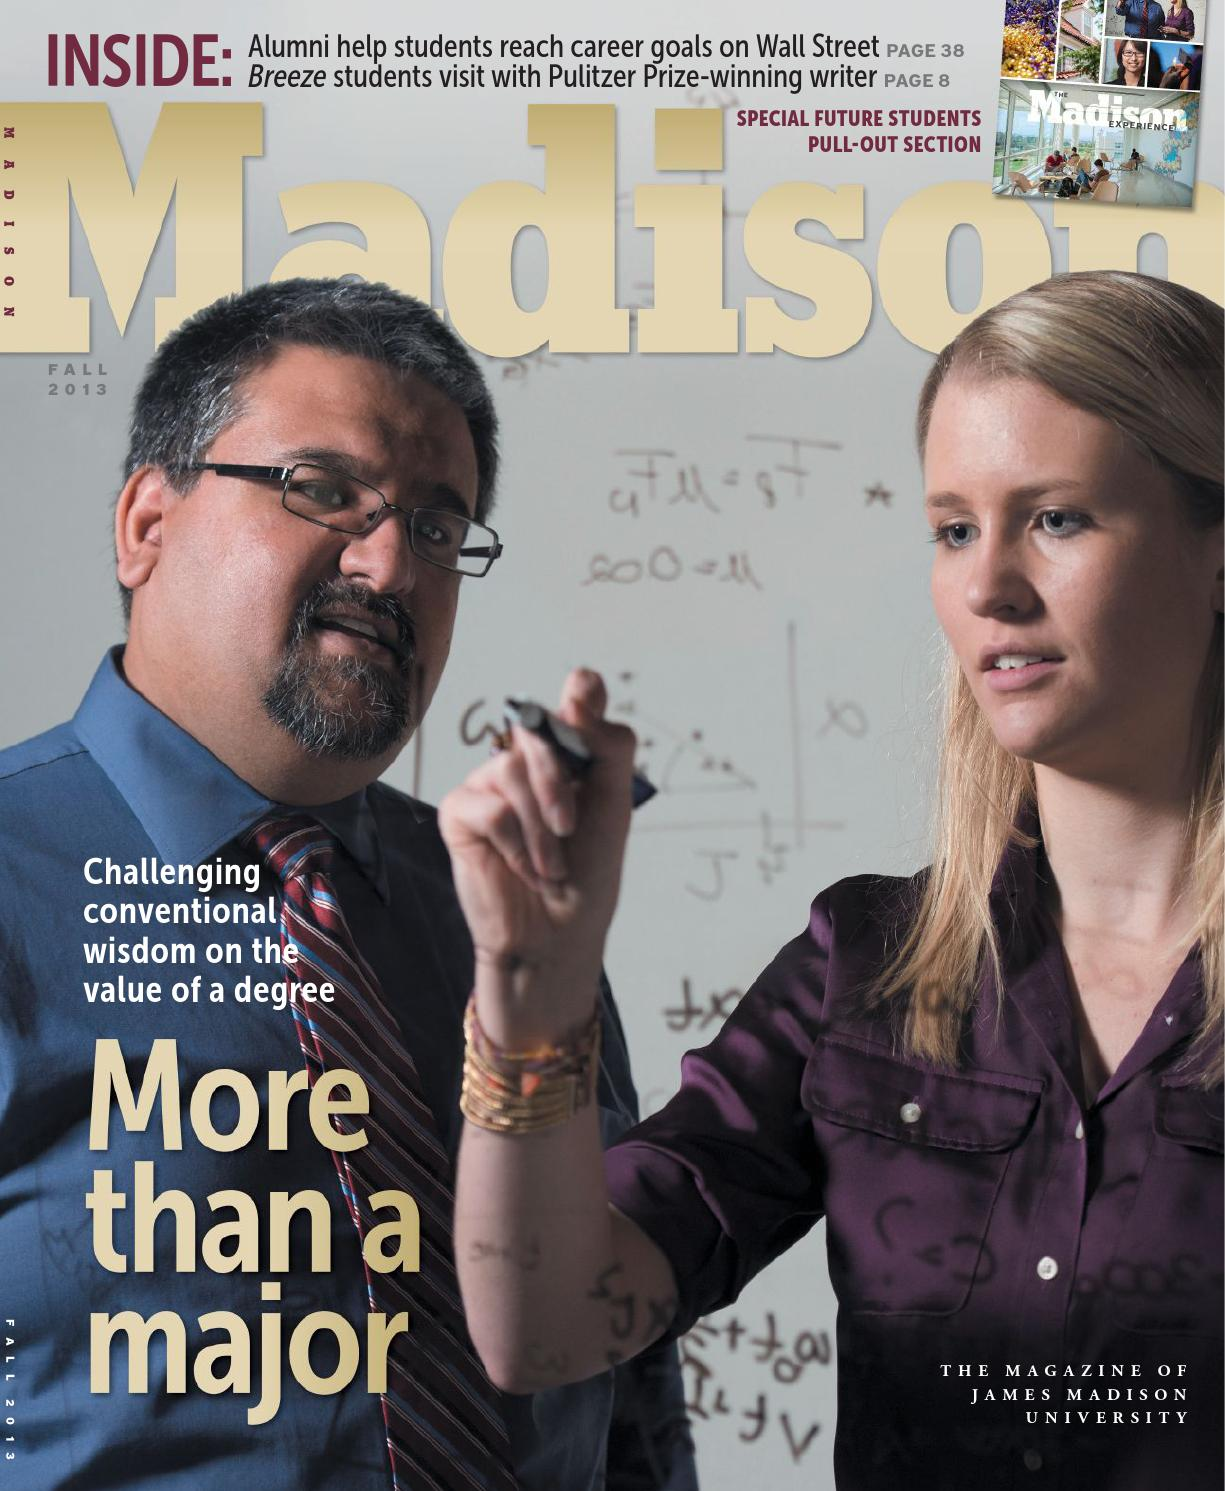 Madison magazine fall 2013 by james madison university issuu fandeluxe Gallery